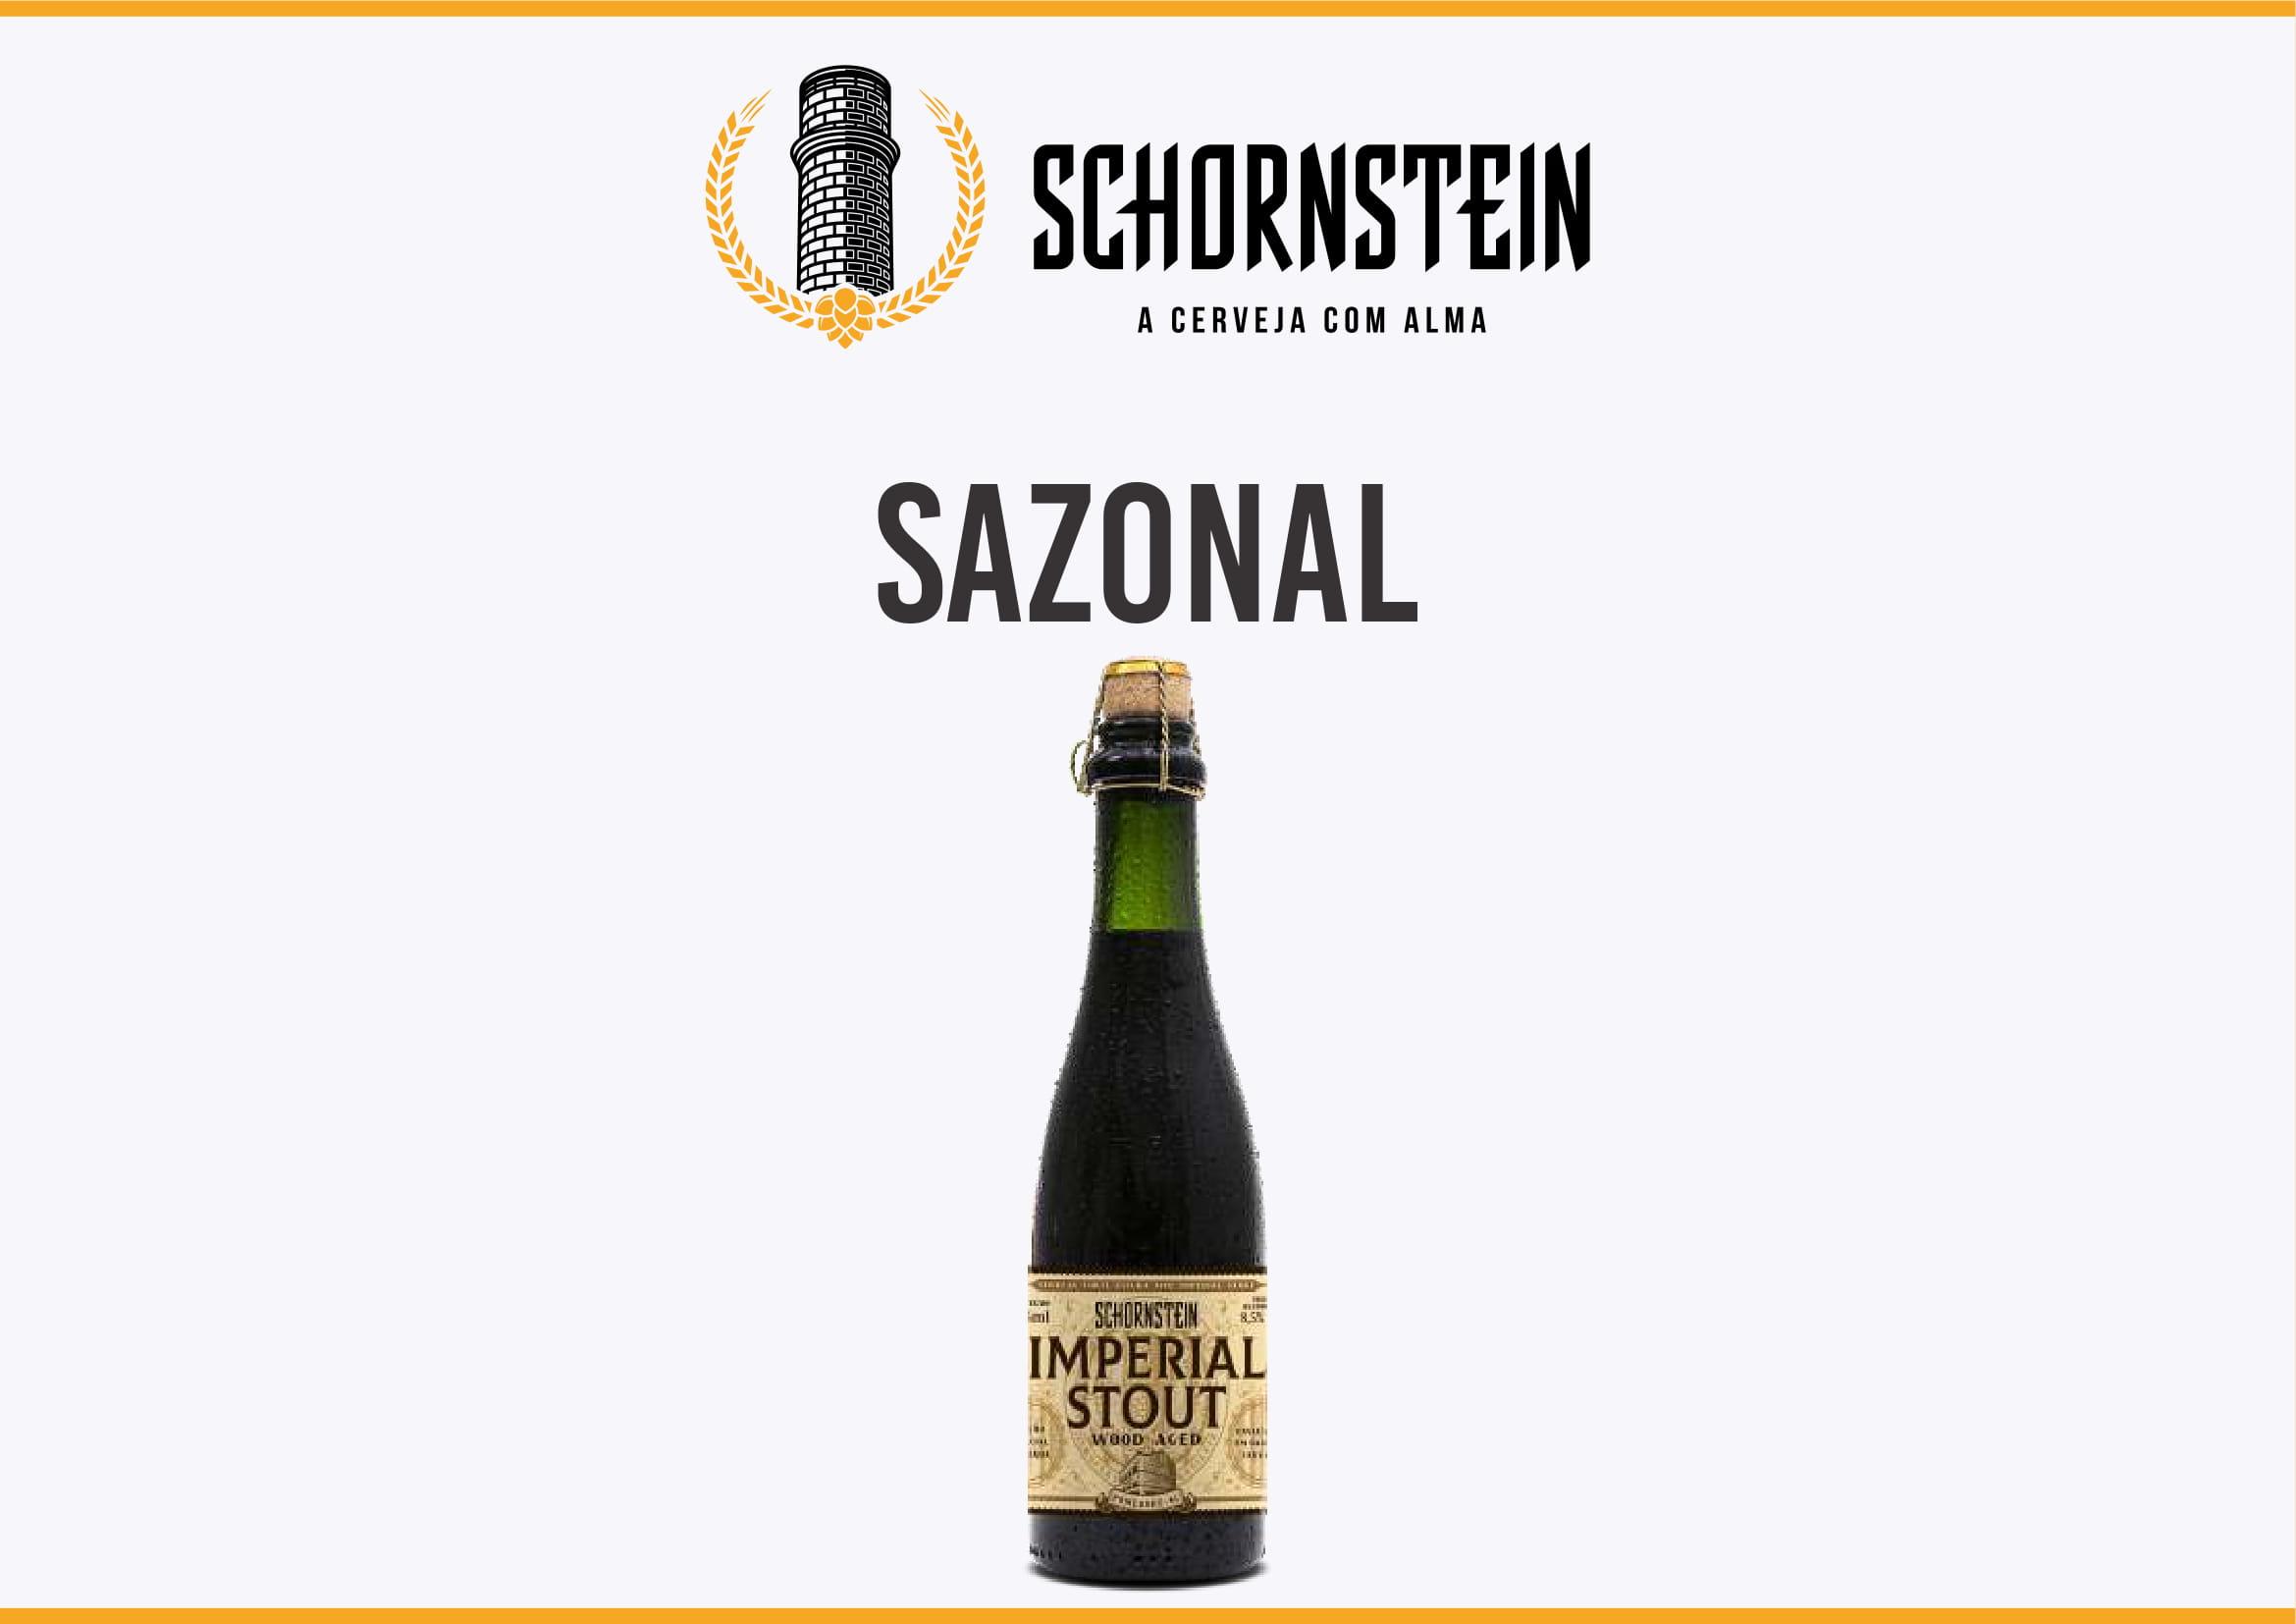 Schornstein Sazonal